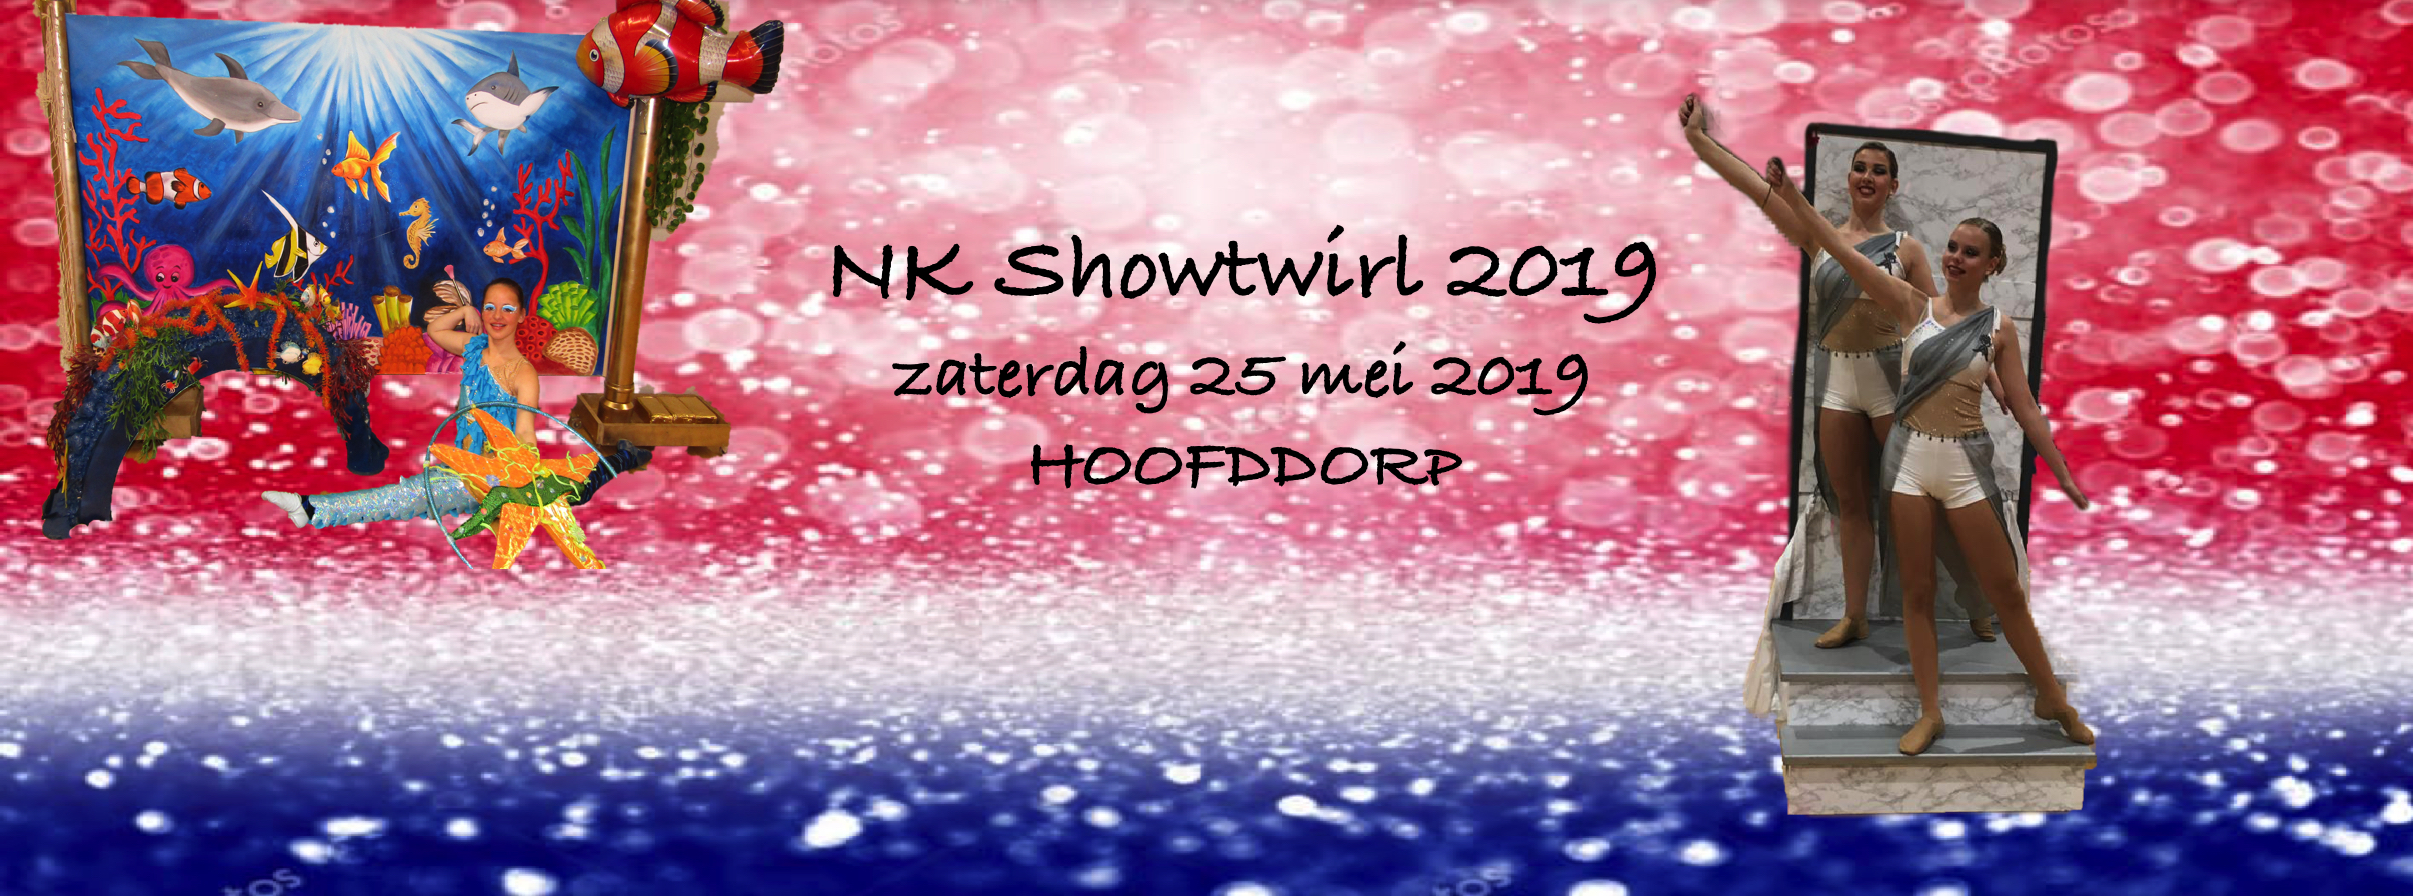 NK Showtwirl 2019